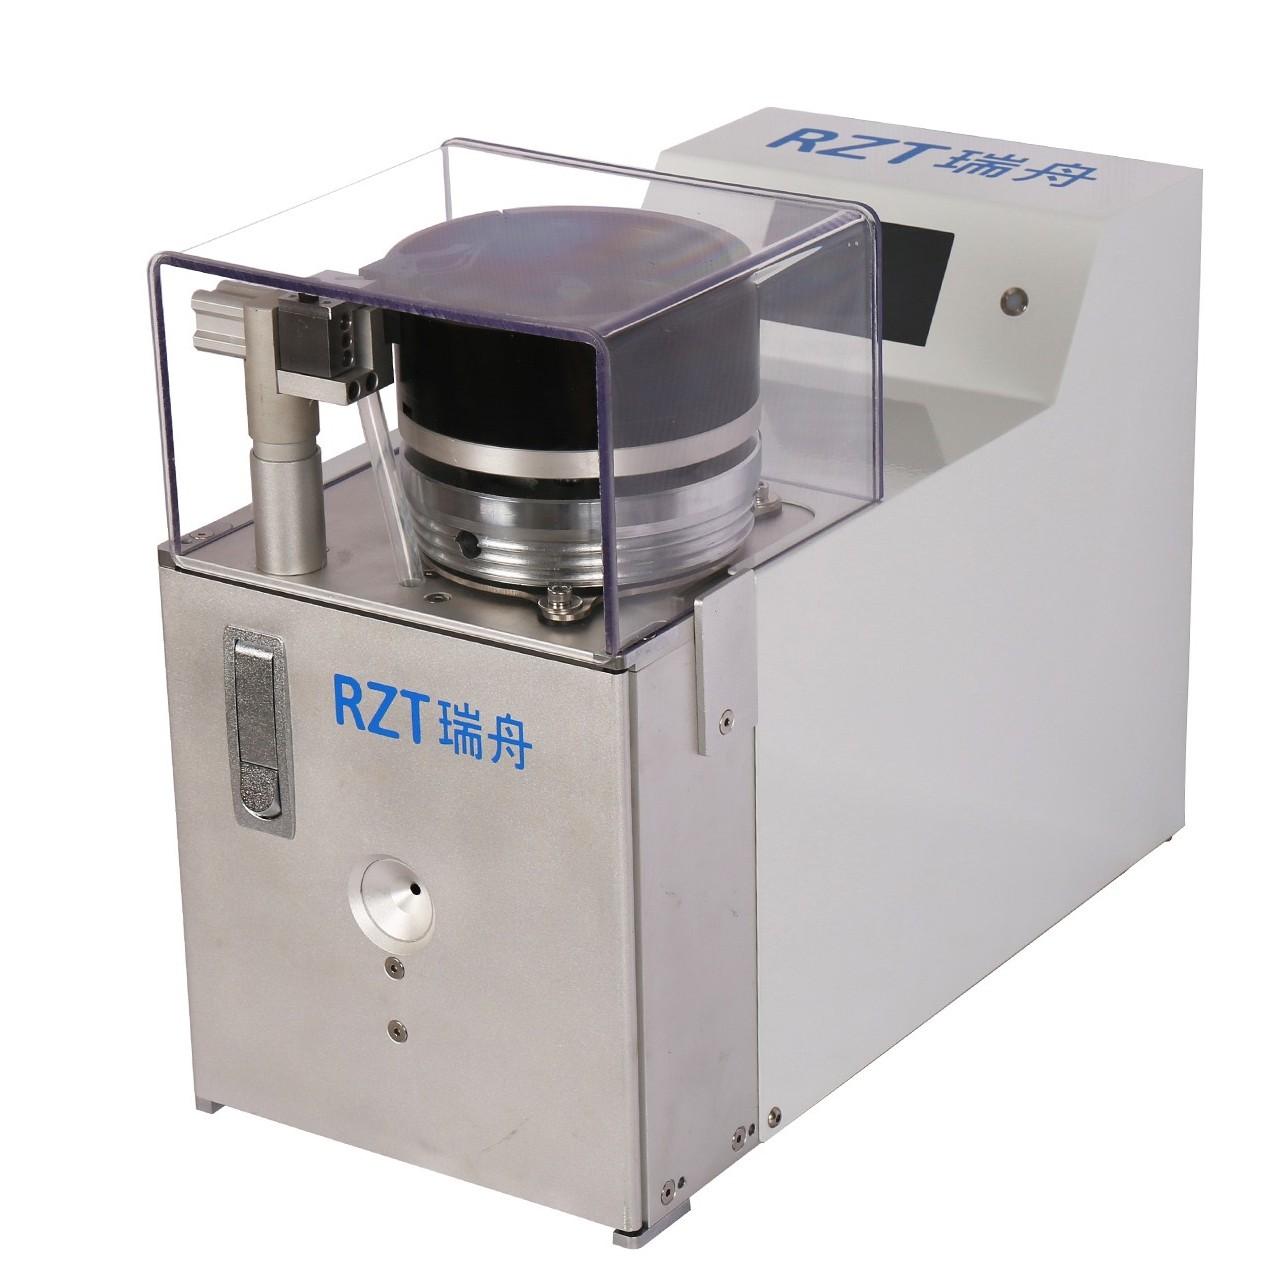 RZT瑞舟管状端子剥线压接一体机RZT-05A